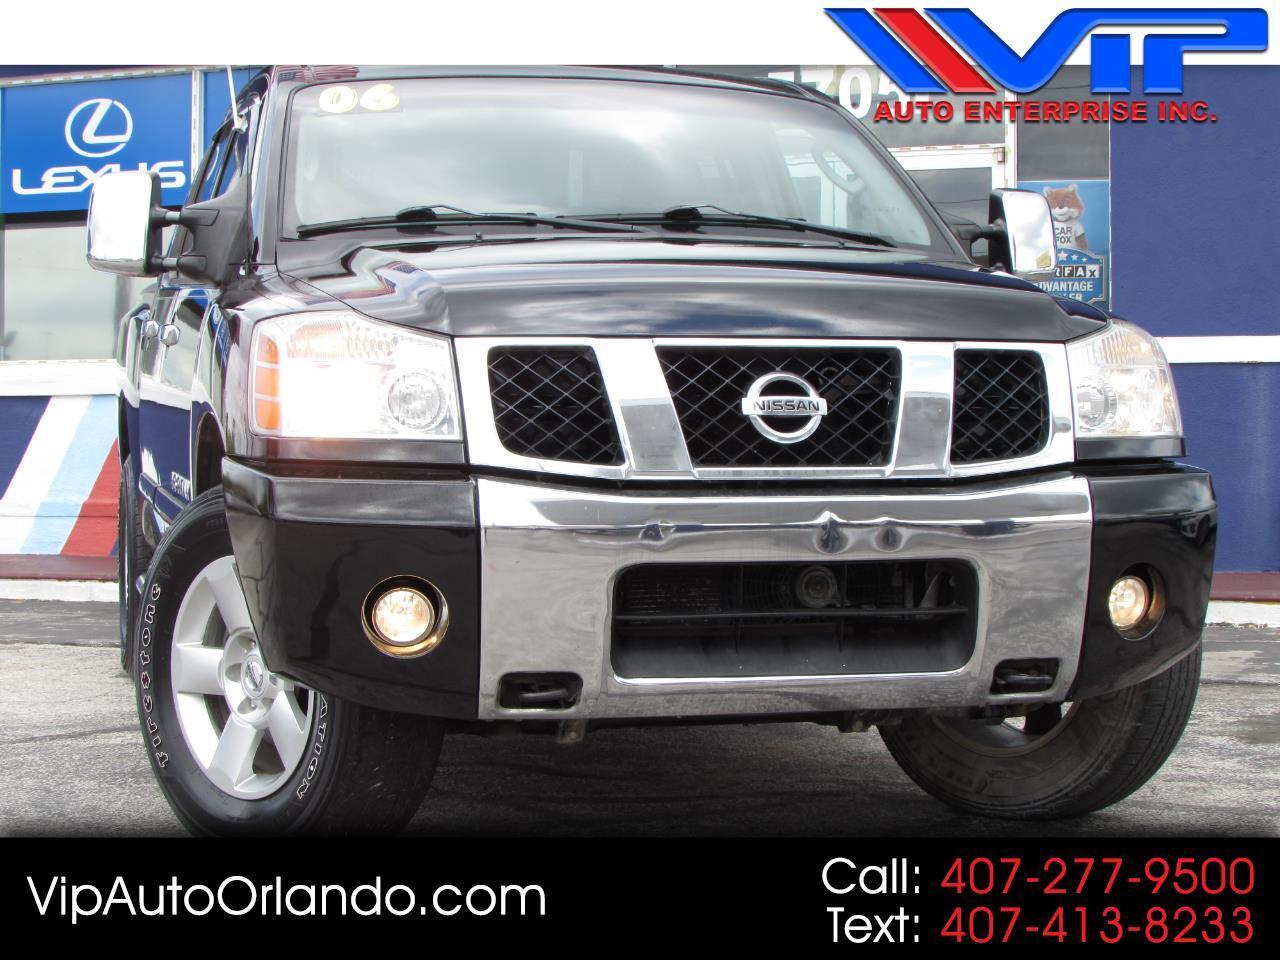 2006 Nissan Titan SE Crew Cab 4WD FFV